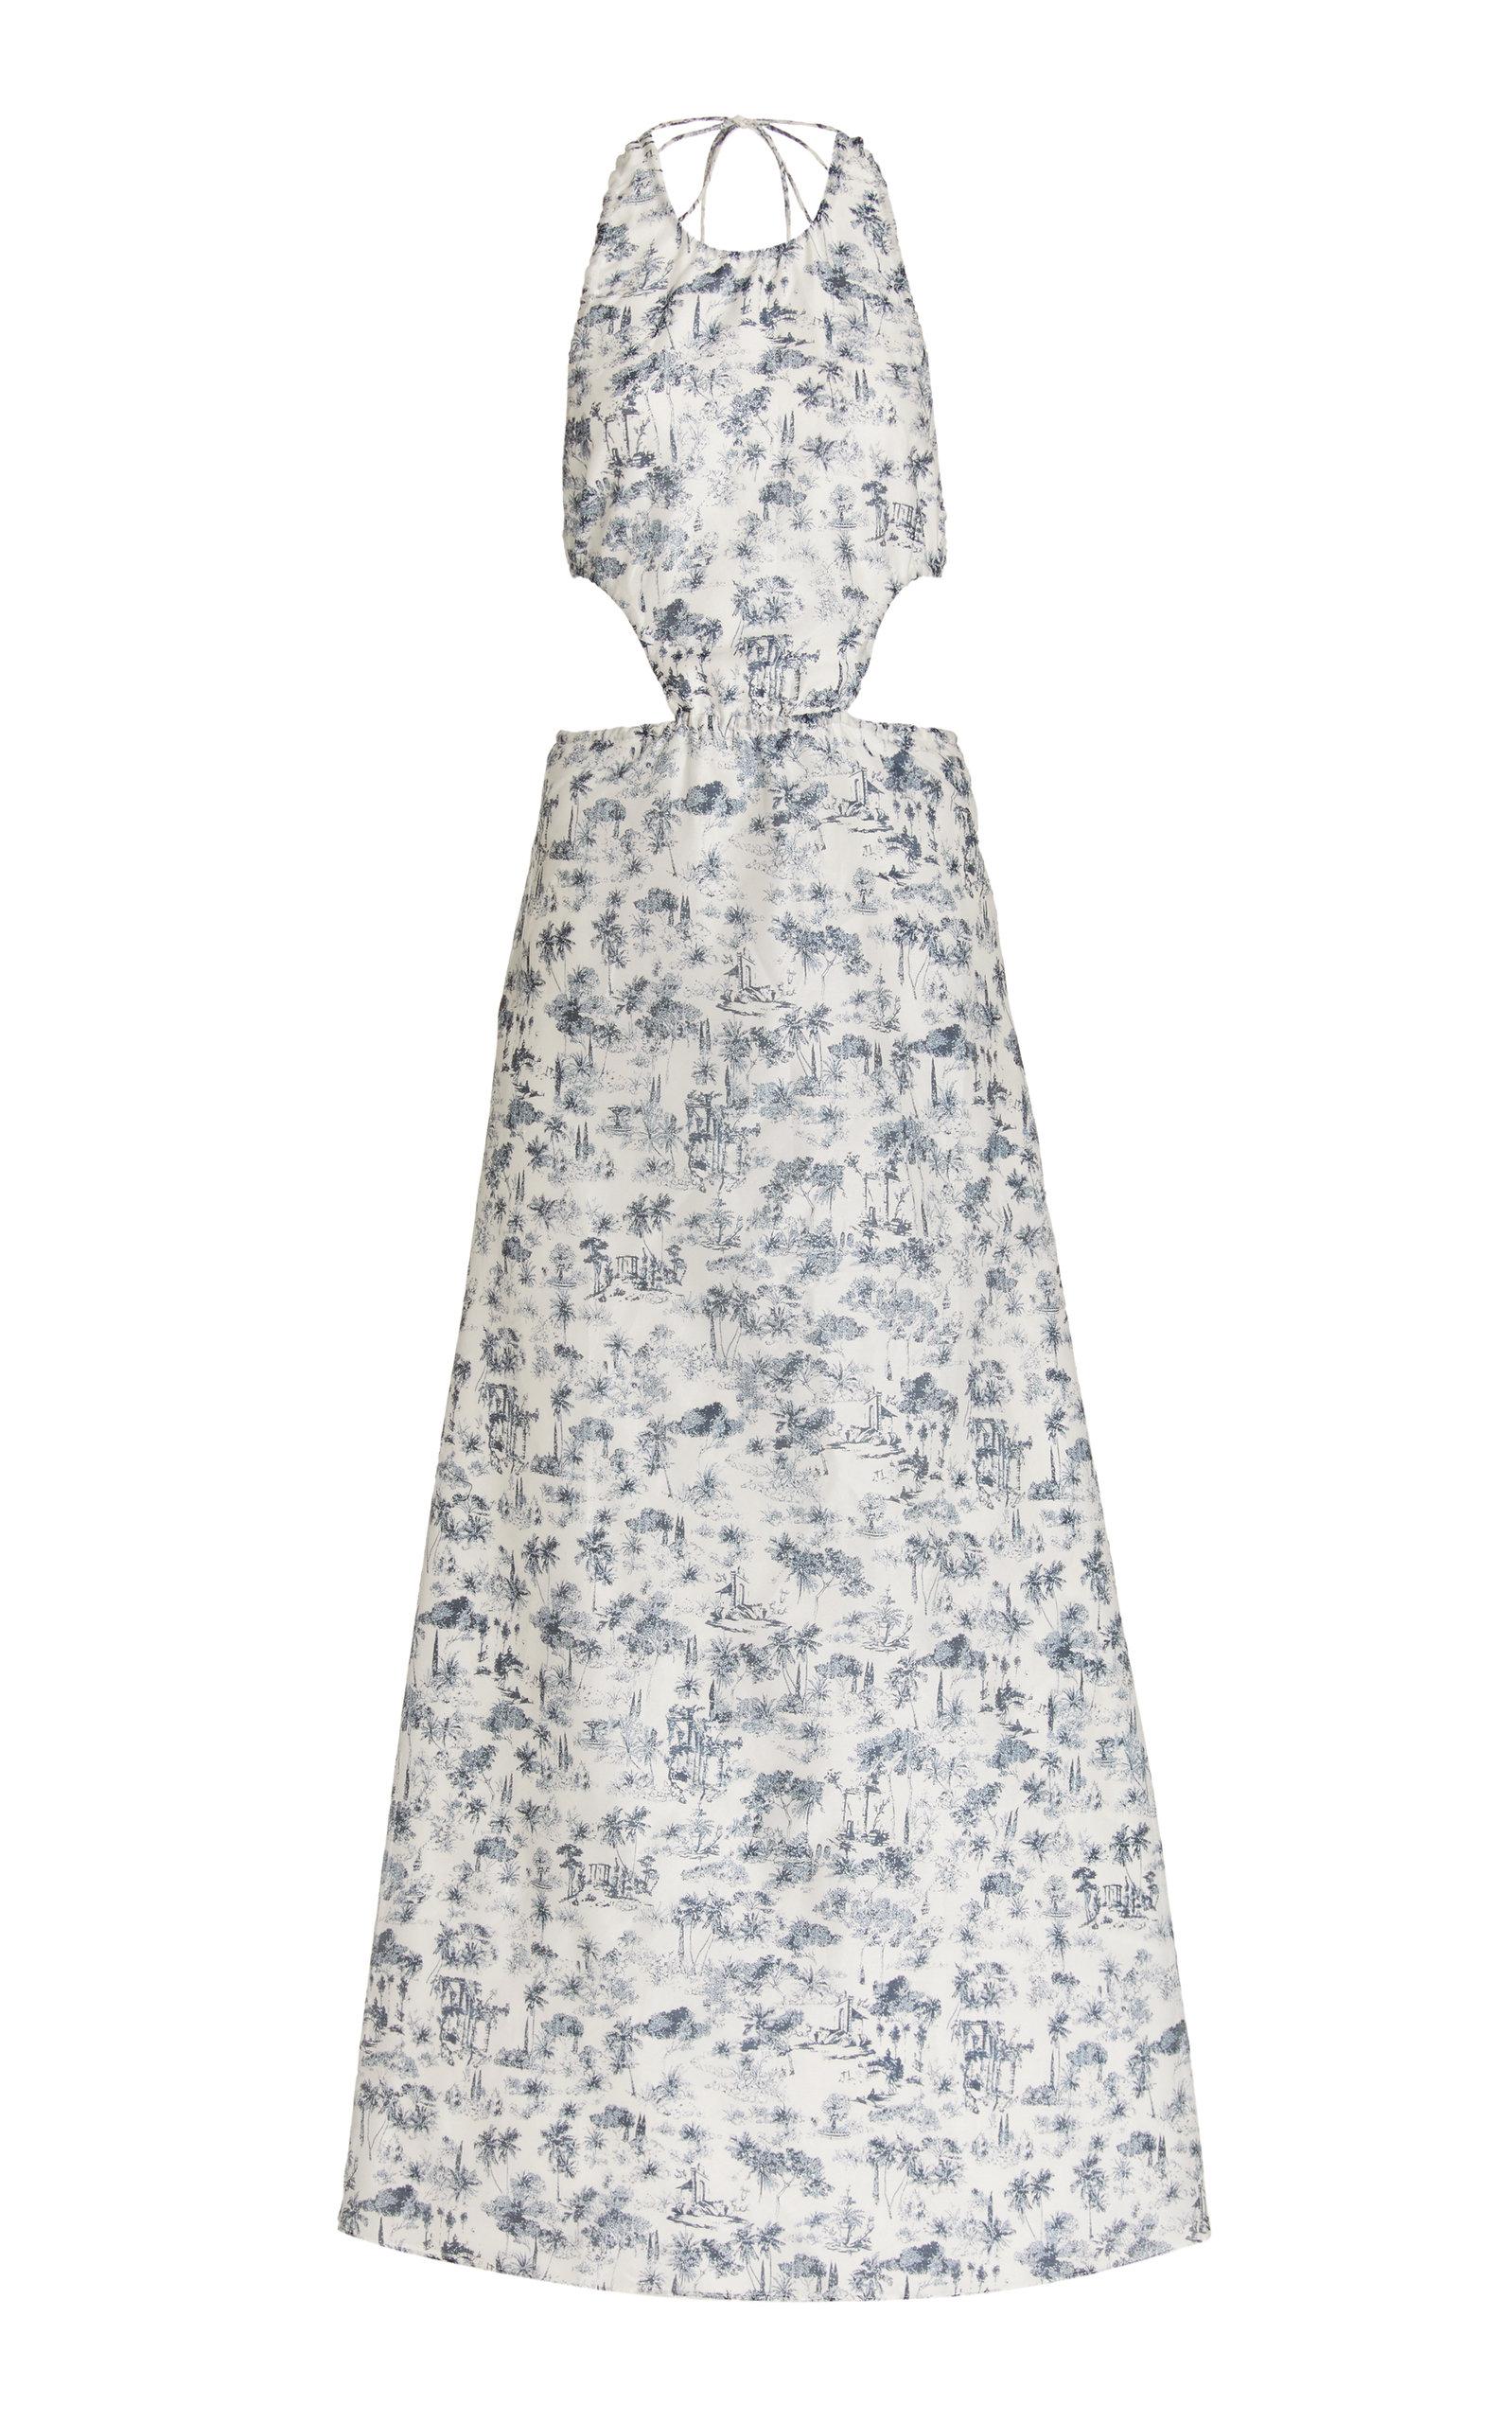 Sir Women's Dimitri Open-back Printed Cotton-silk Maxi Dress In Multi